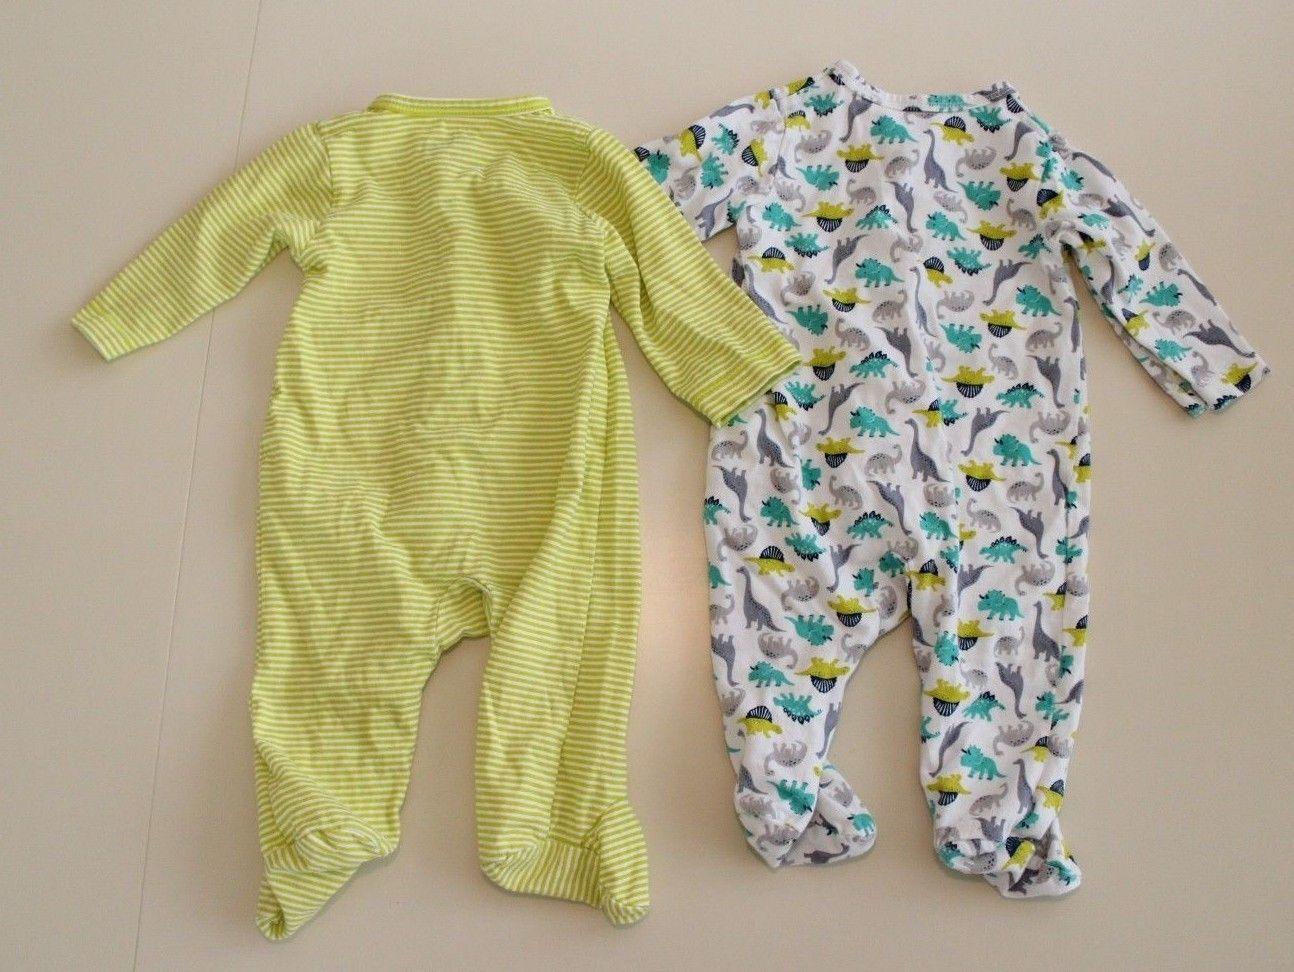 9c2e20f417b1 Just One You 3 M - SET OF 2 Infant Sleeper Pajamas PJs Dino Dinosaur Unisex